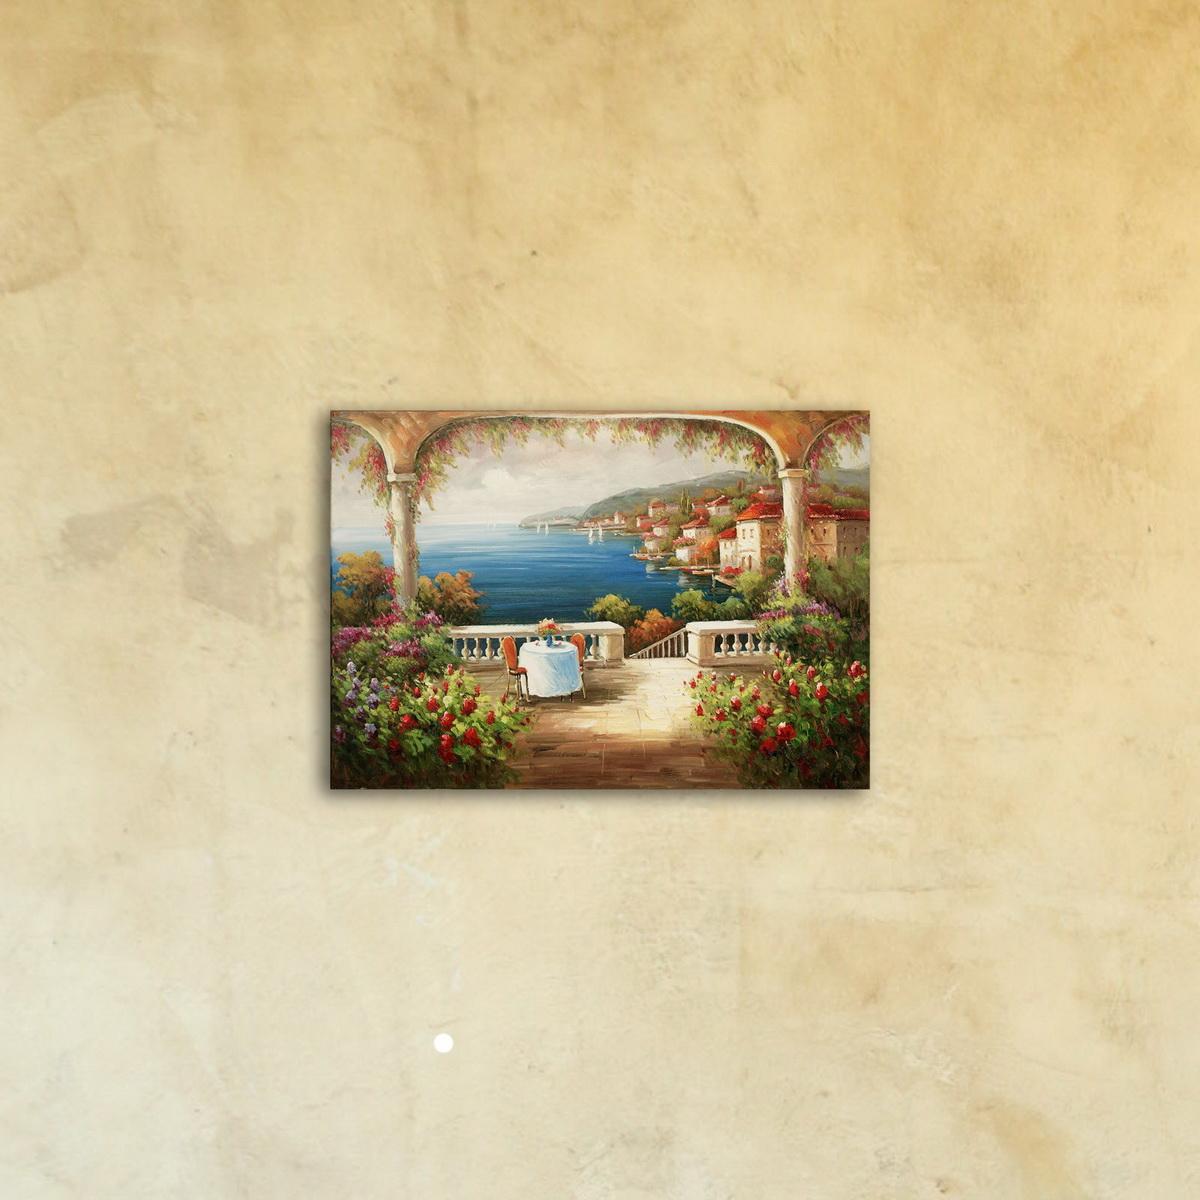 Картина для Интерьера «Вид на море» стекло